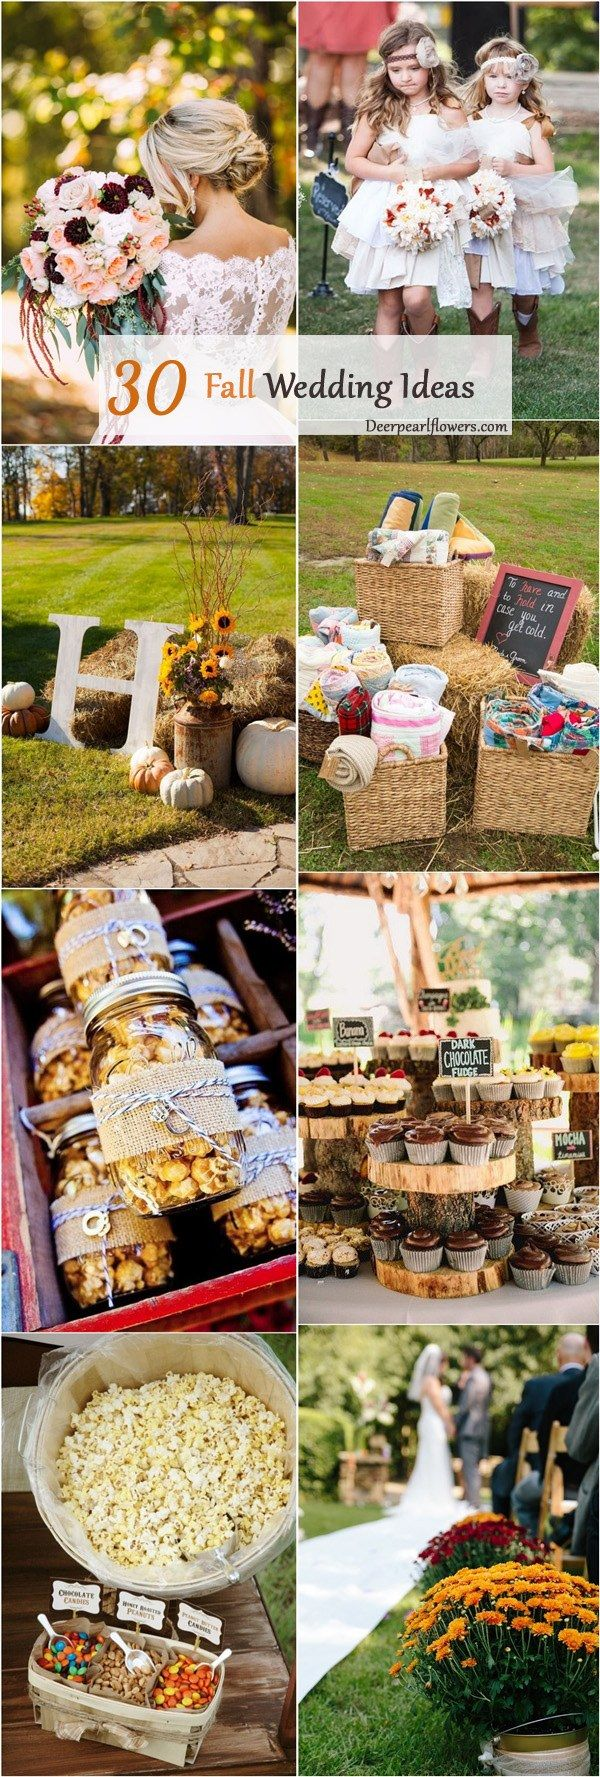 outdoor fall wedding ideas and themes / http://www.deerpearlflowers.com/autumn-fall-wedding-ideas/